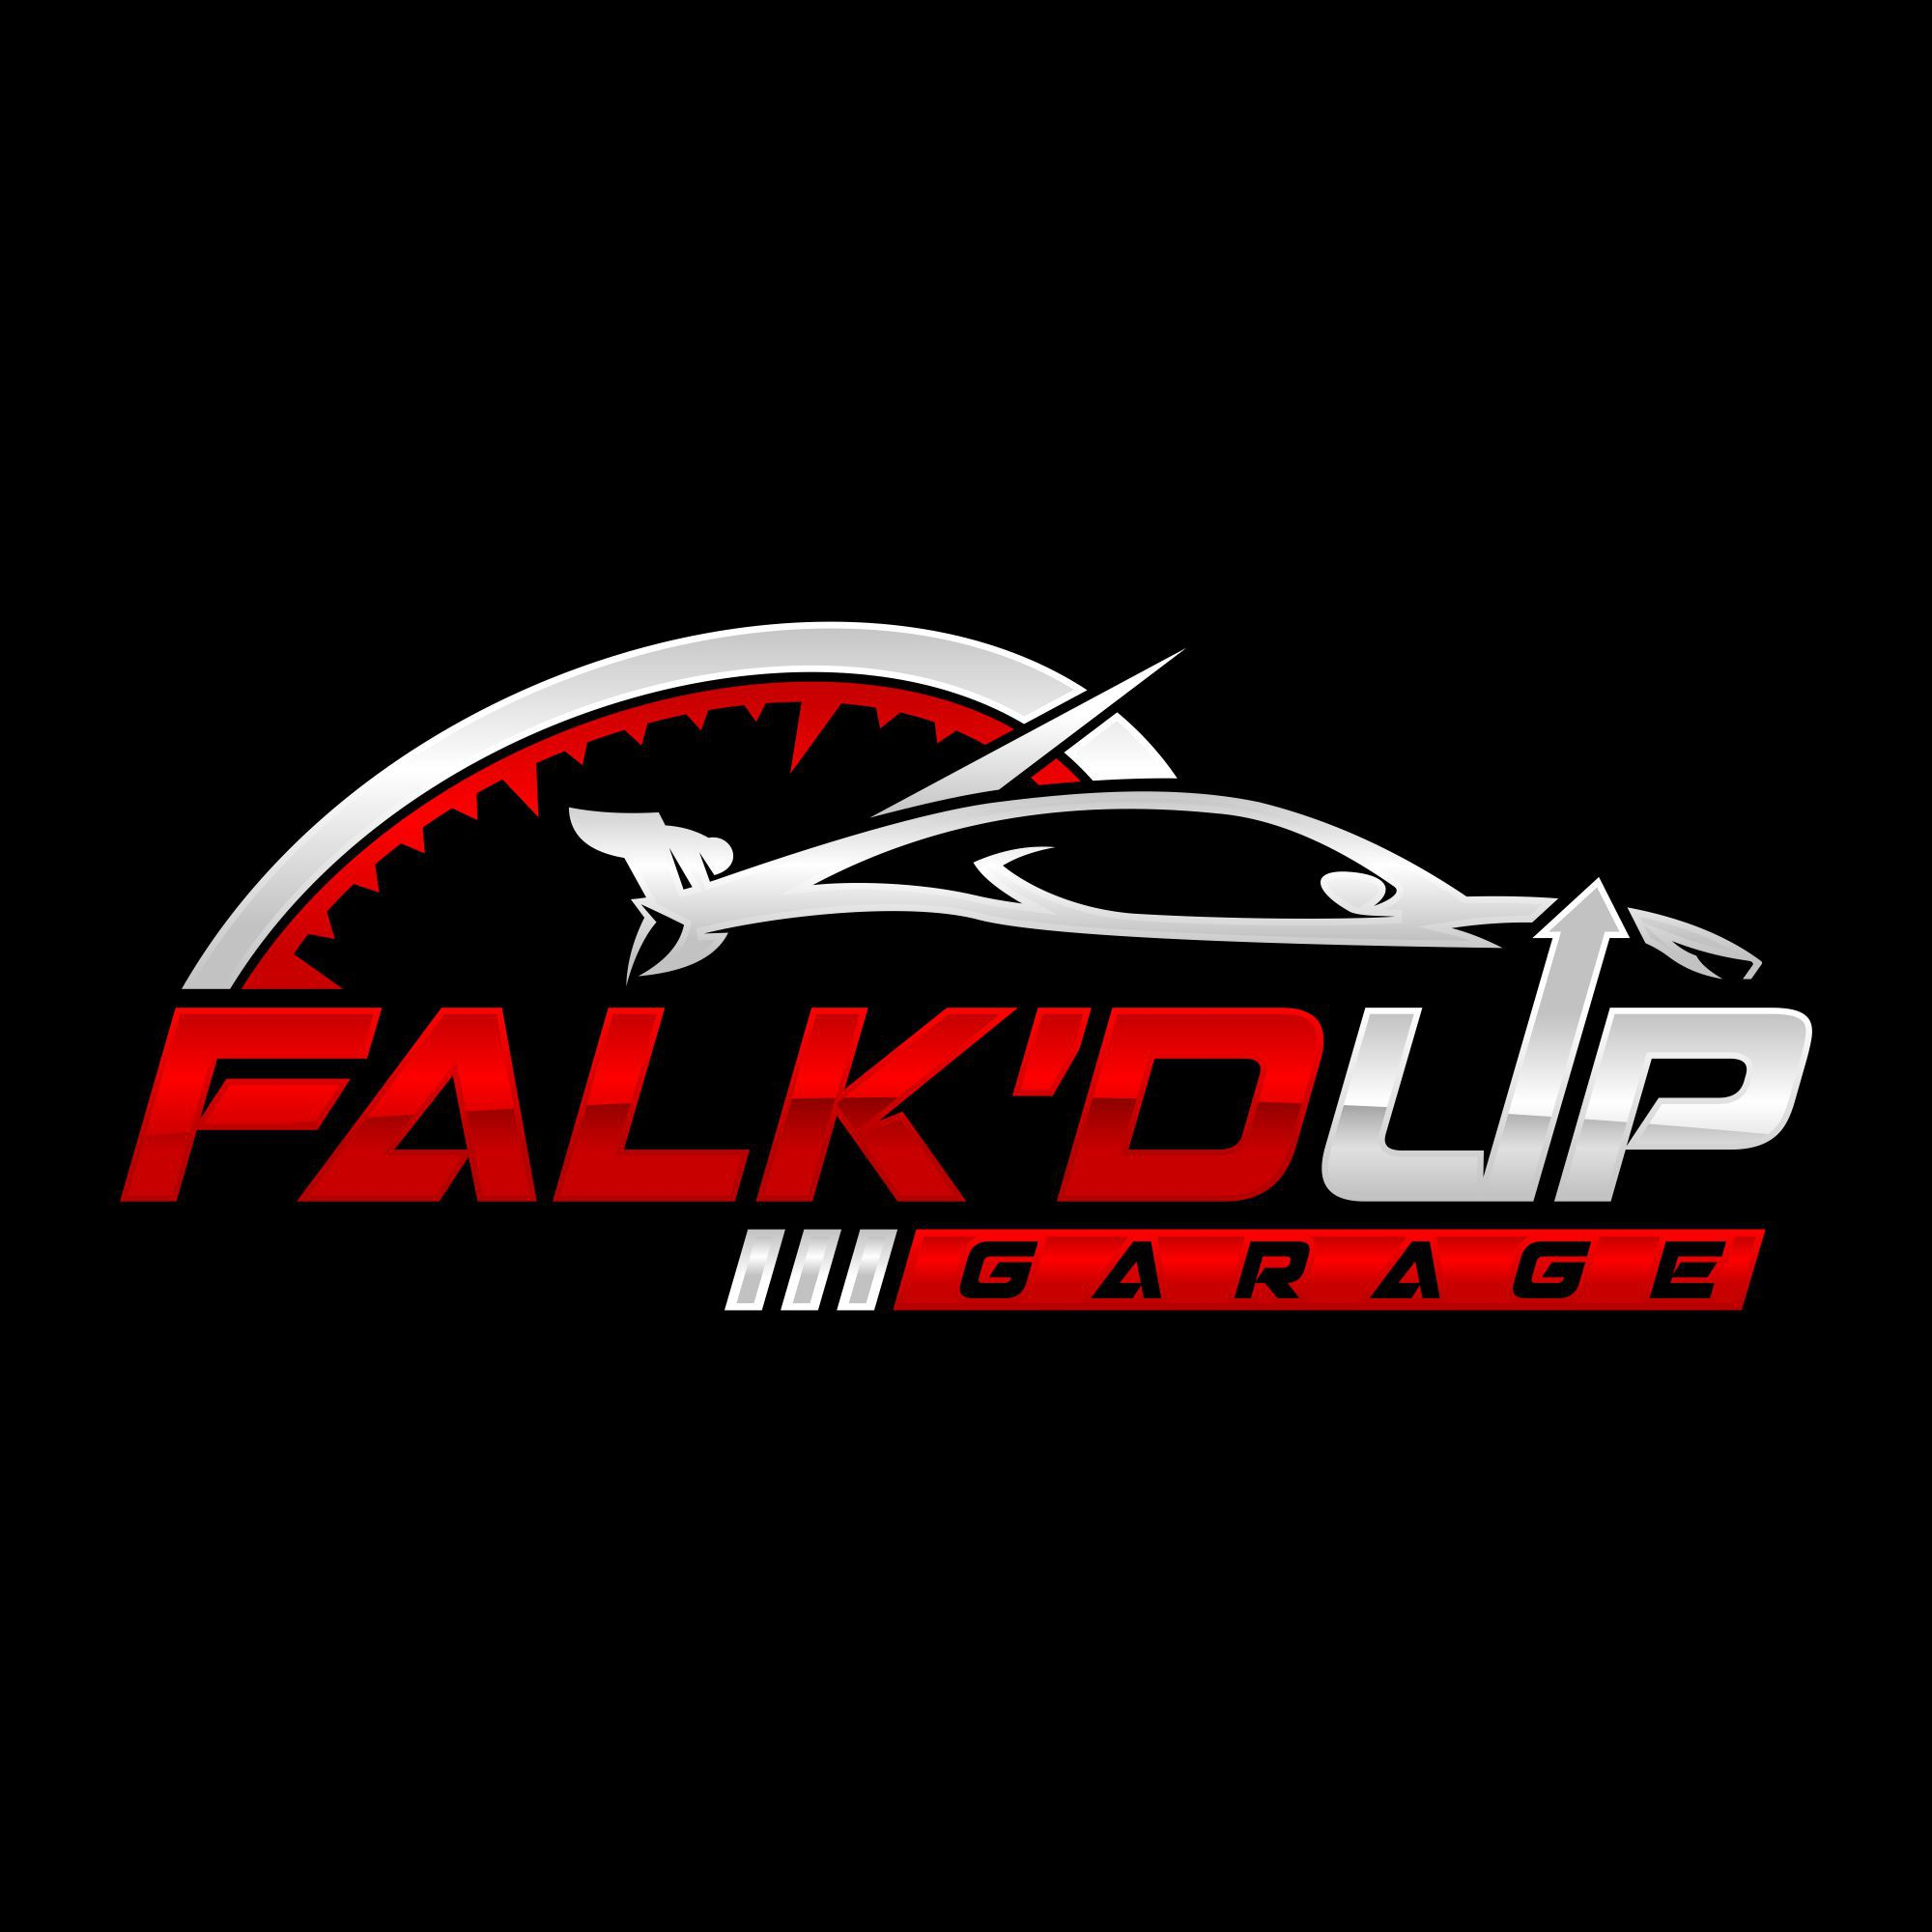 Falk'd Up Garage